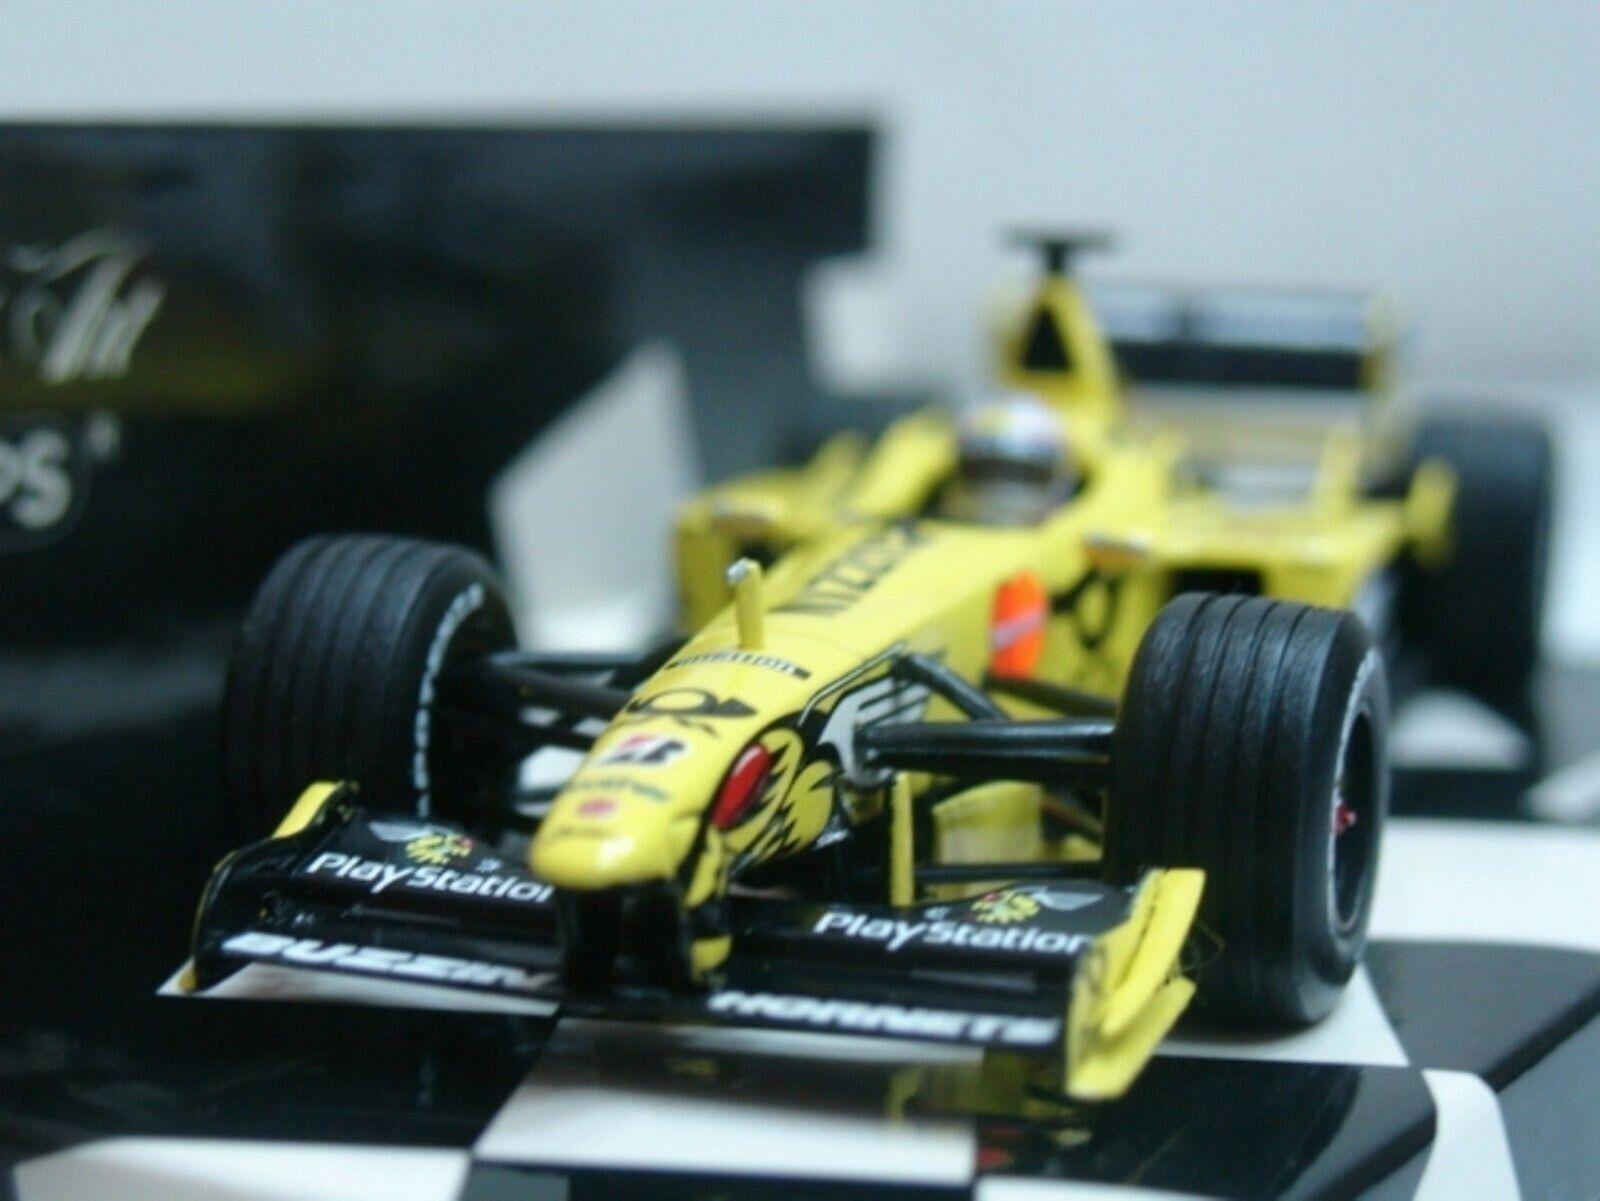 Wow extrêmeHommest rare  Jordan EJ10 Mugen Honda Sato Test Jerez 2000 1 43 Minichamps  nouveau sadie